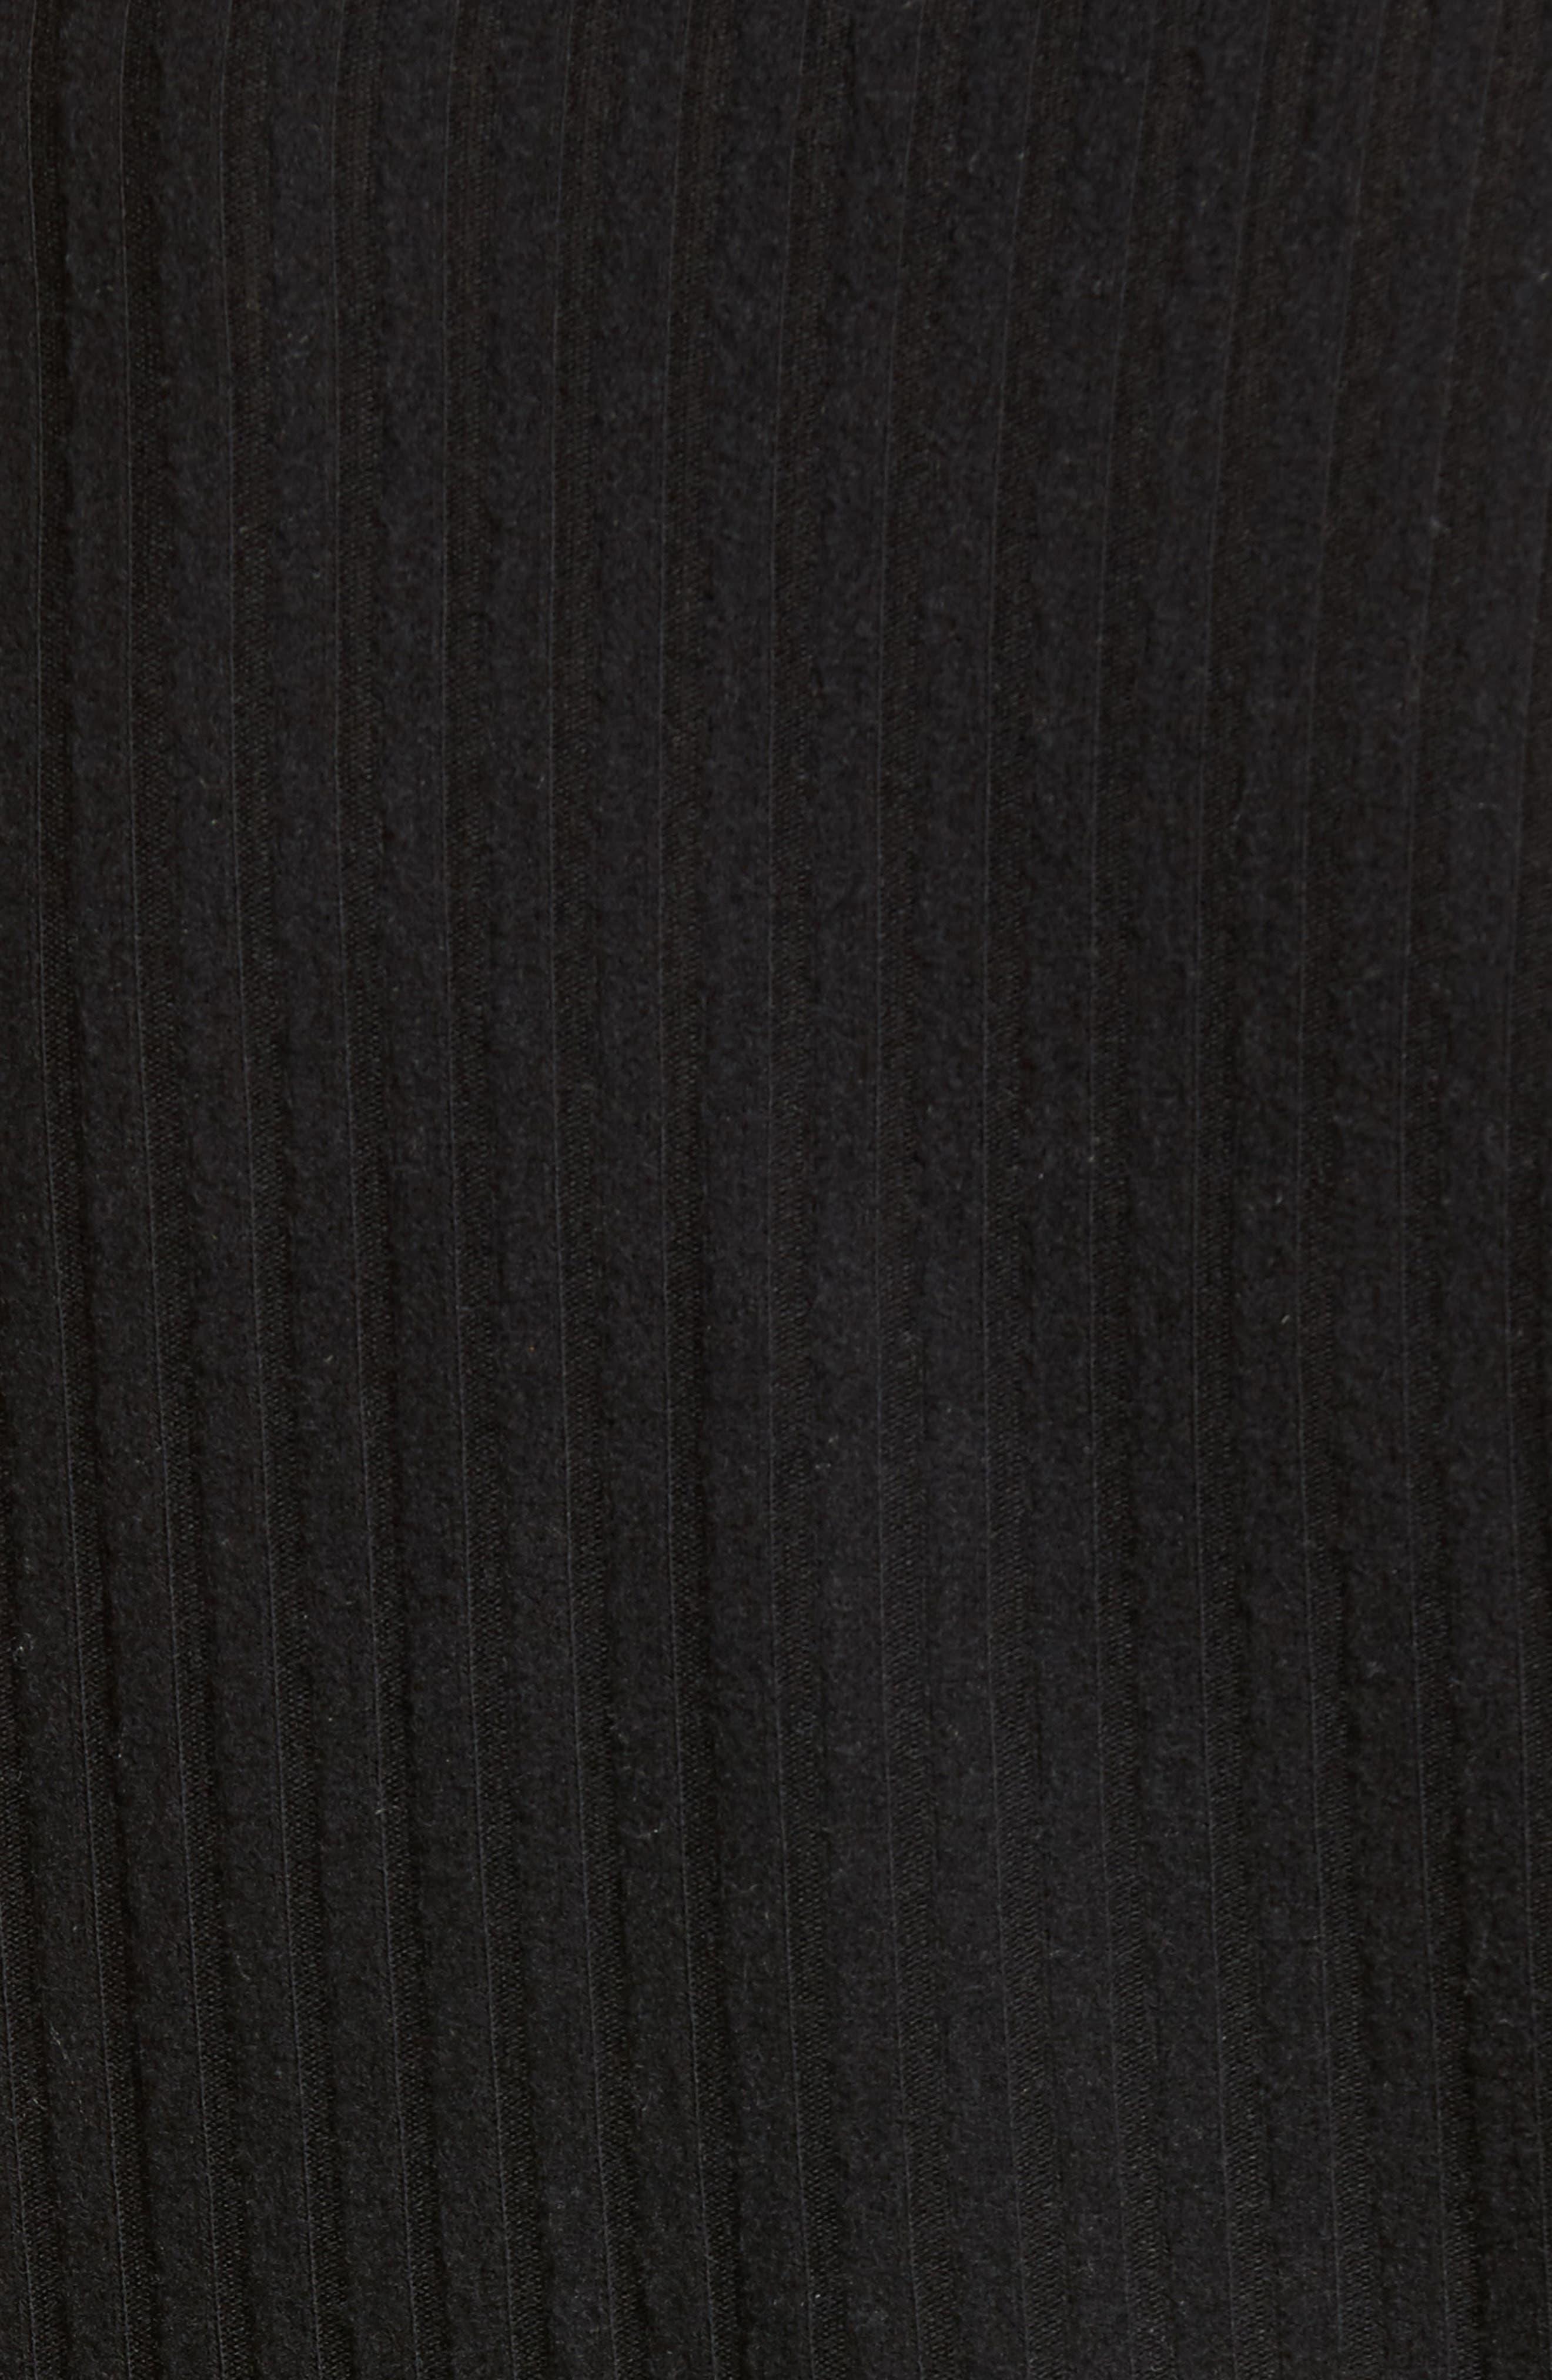 Mock Neck Ribbed Top,                             Alternate thumbnail 5, color,                             Black